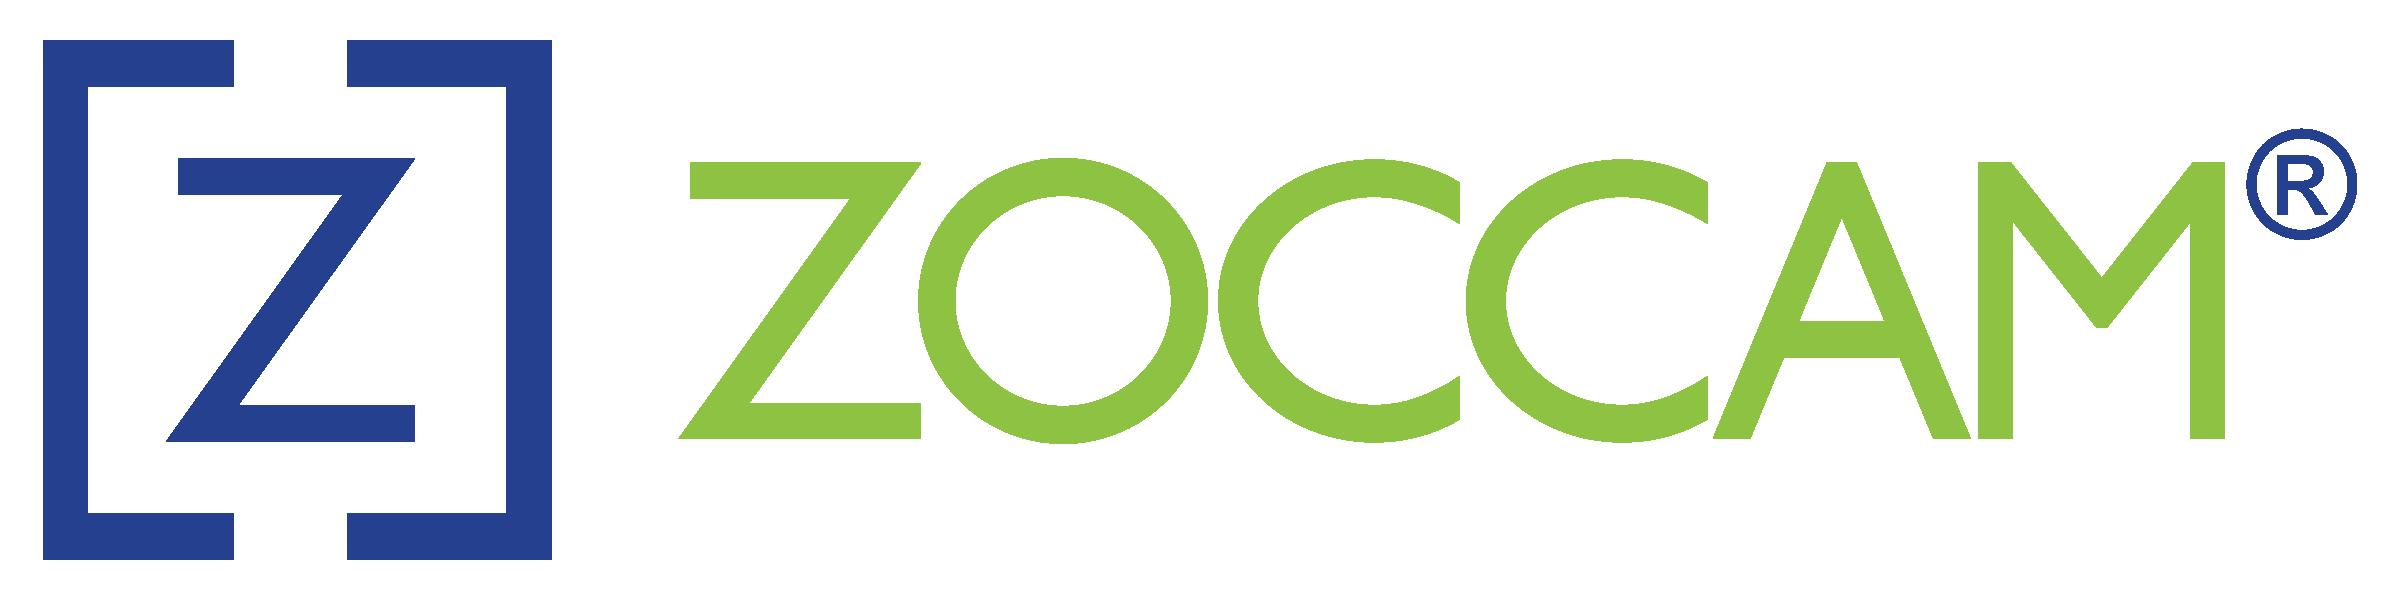 https://www.zoccam.com